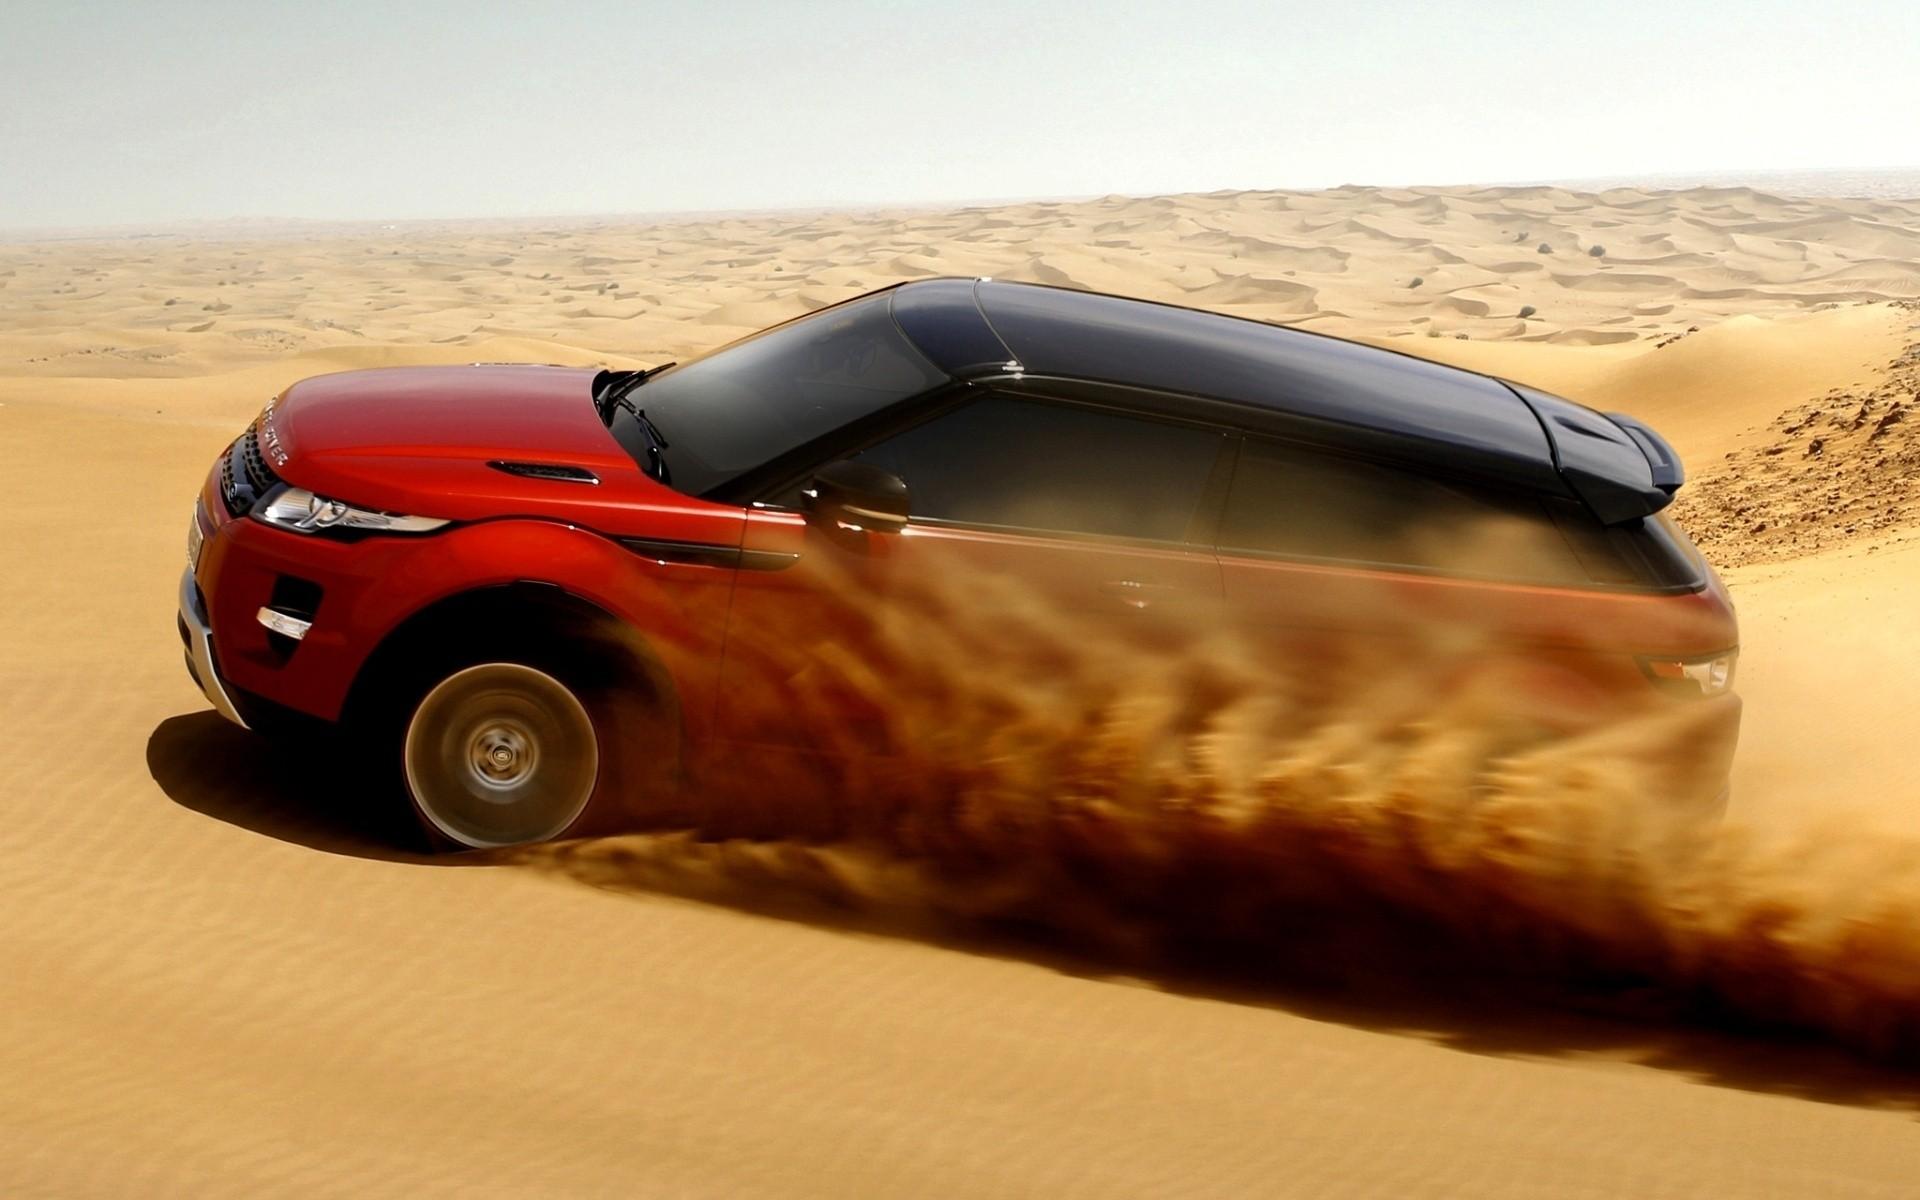 Range Rover Sport - 1920x1200